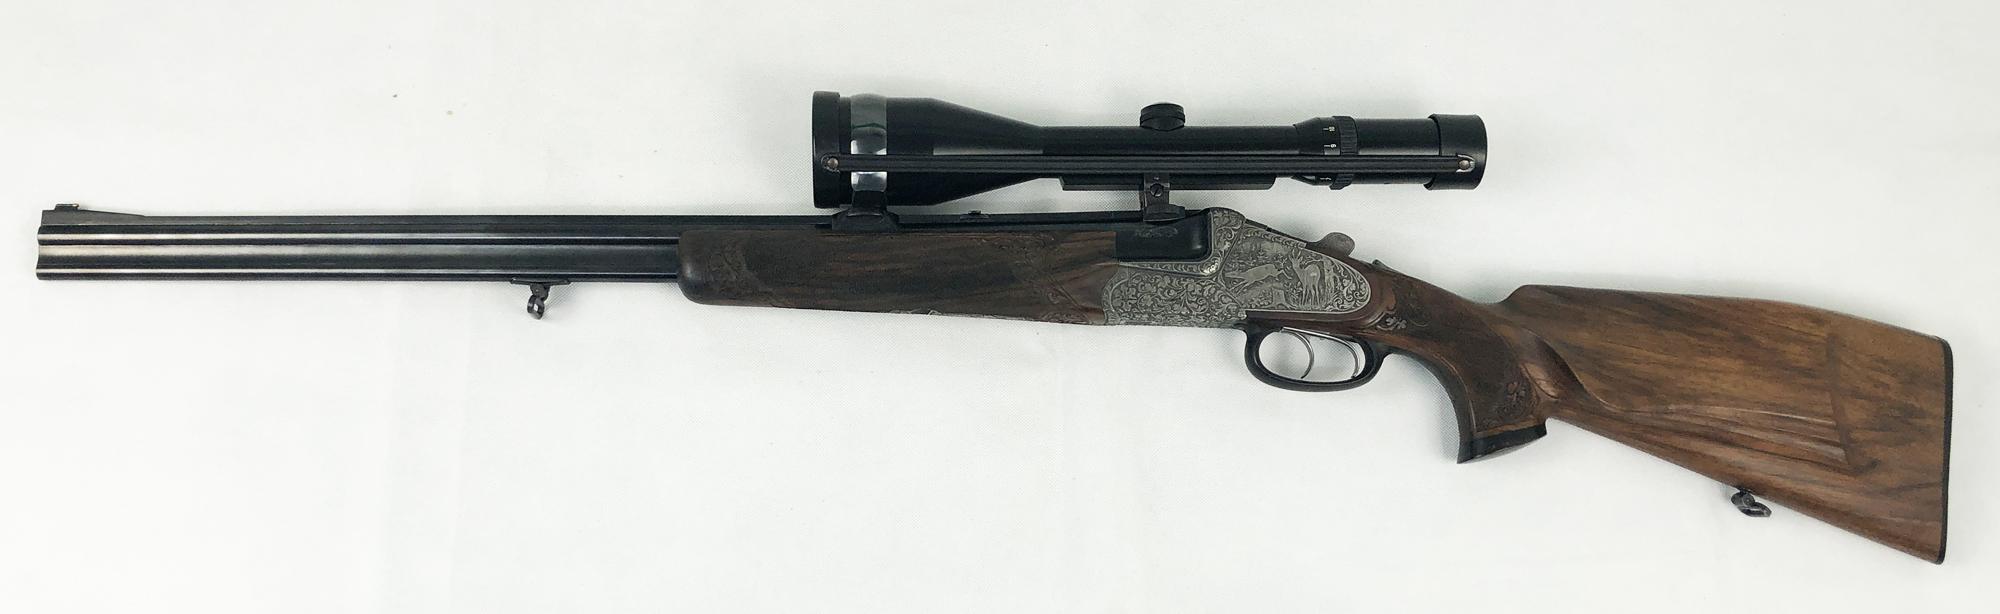 Bockbüchsflinte Siegfried Hadler 5,6x52R - .410